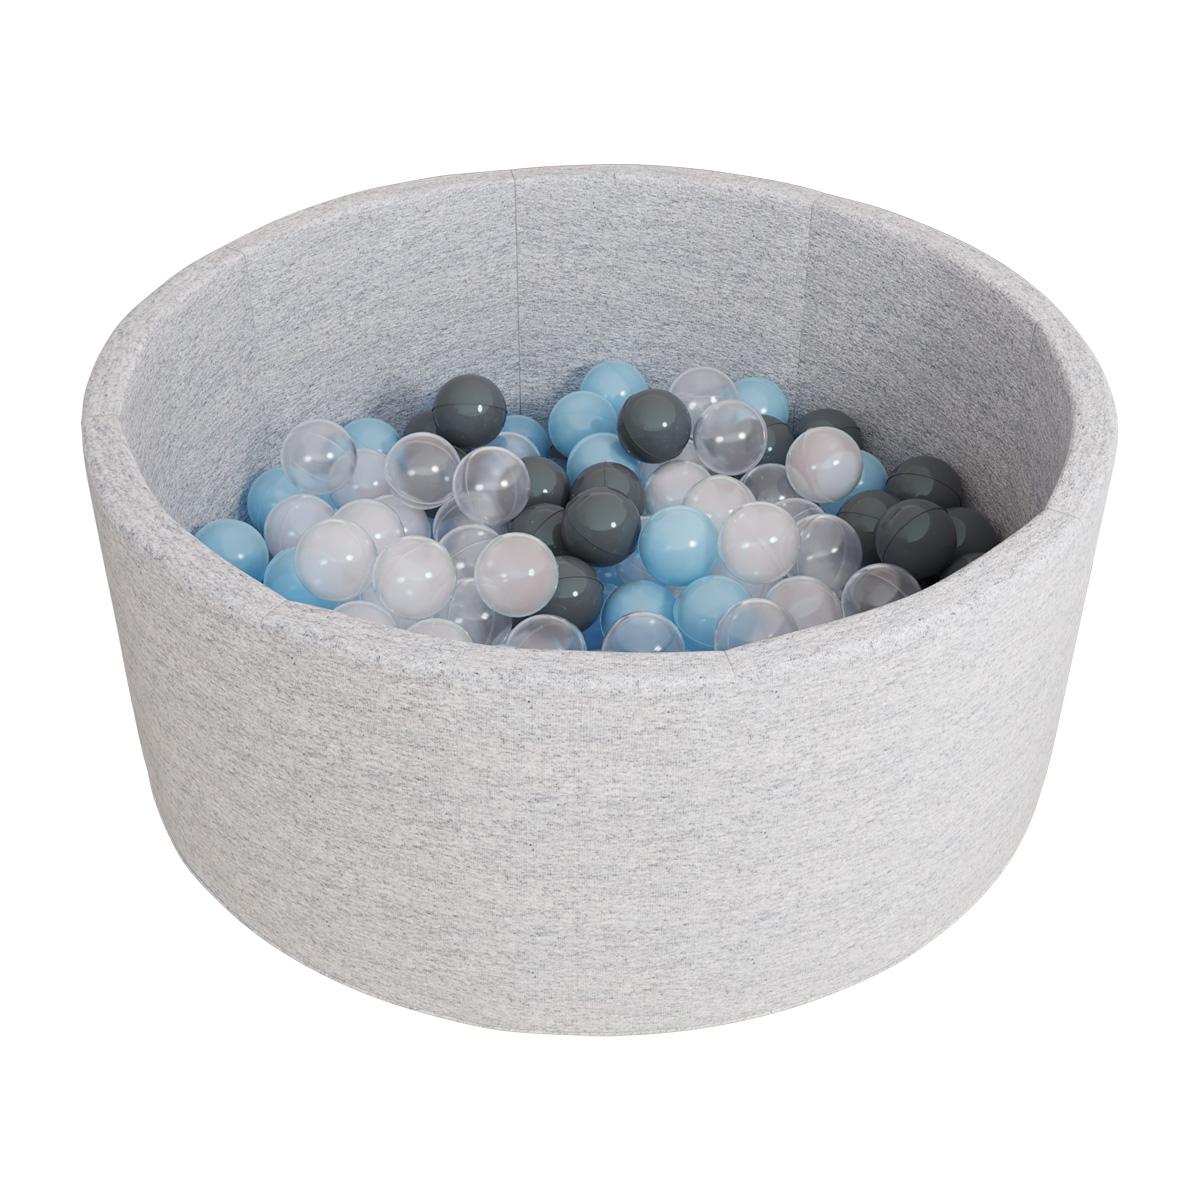 Купить Сухой бассейн Romana – Airpool, ДМФ-МК-02.53.01, серый с серыми шариками